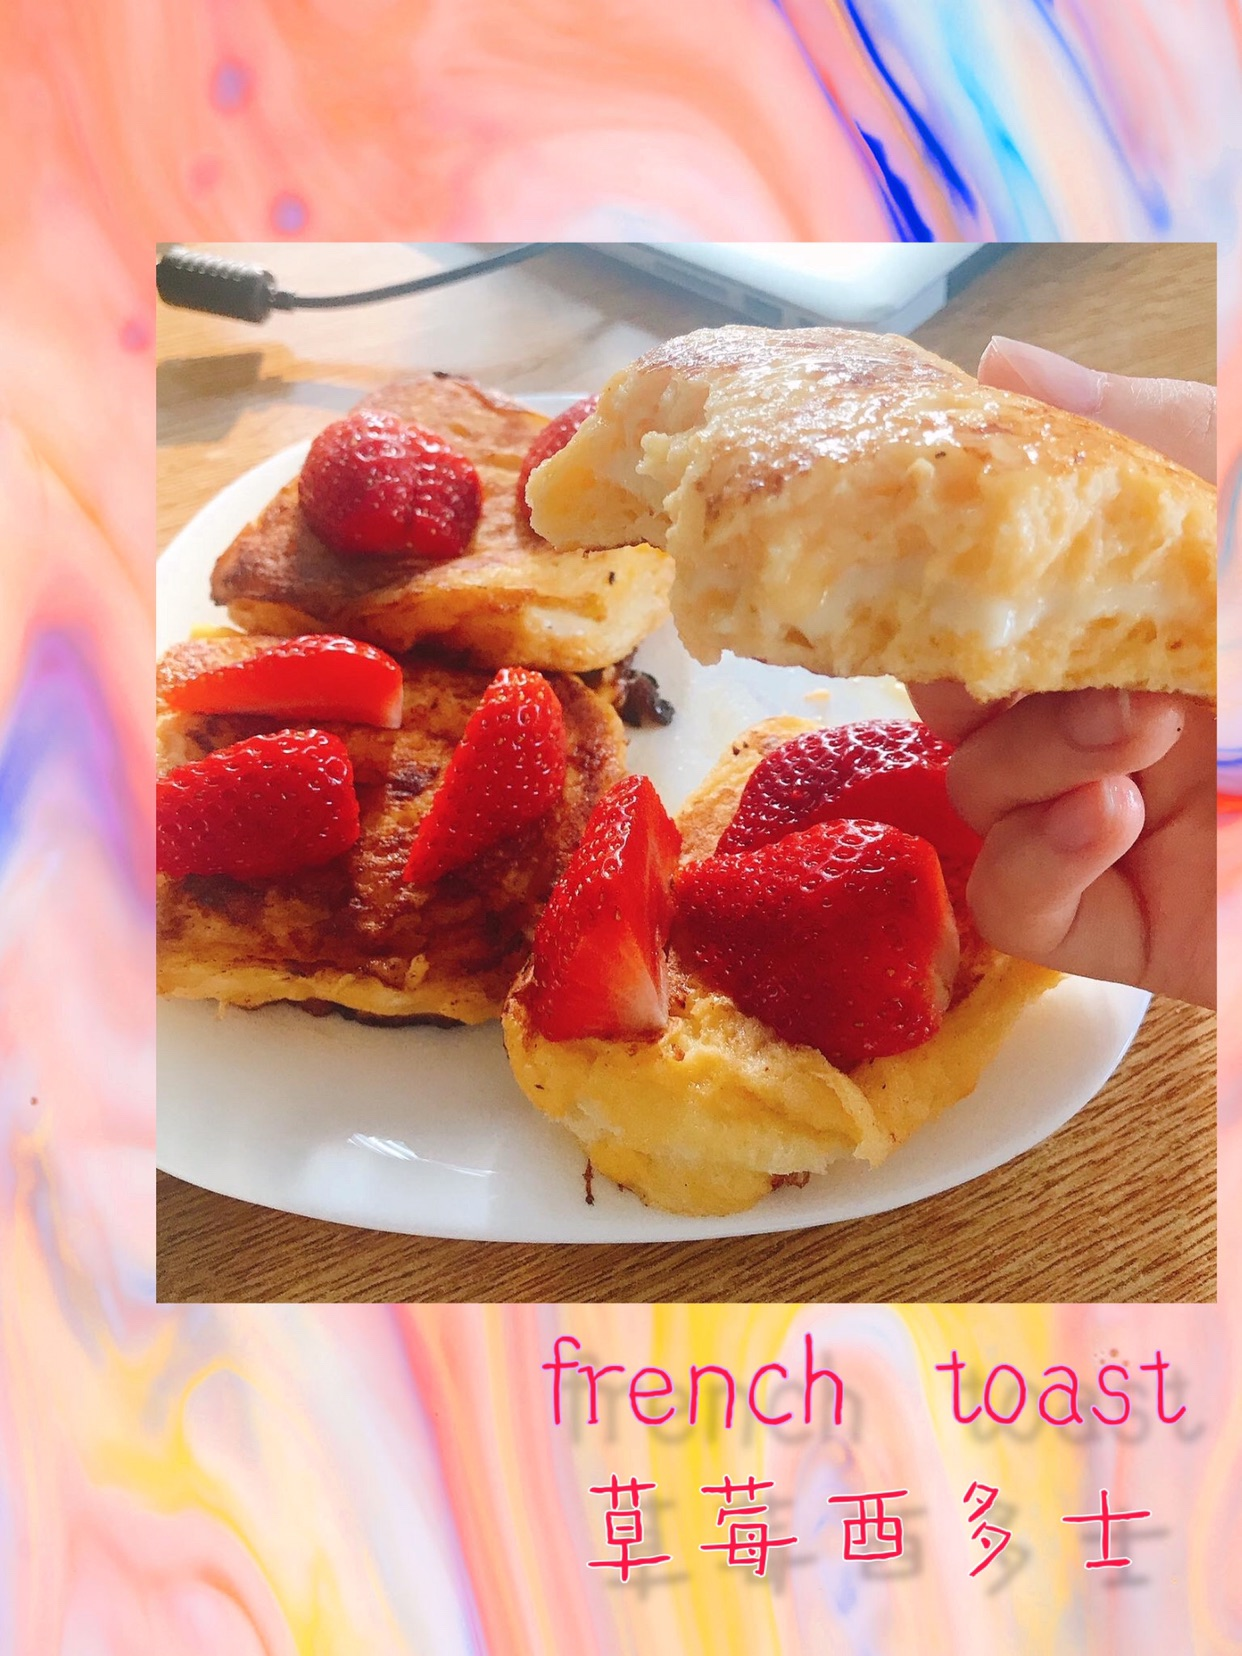 【french toase】宅家做甜品不无聊!